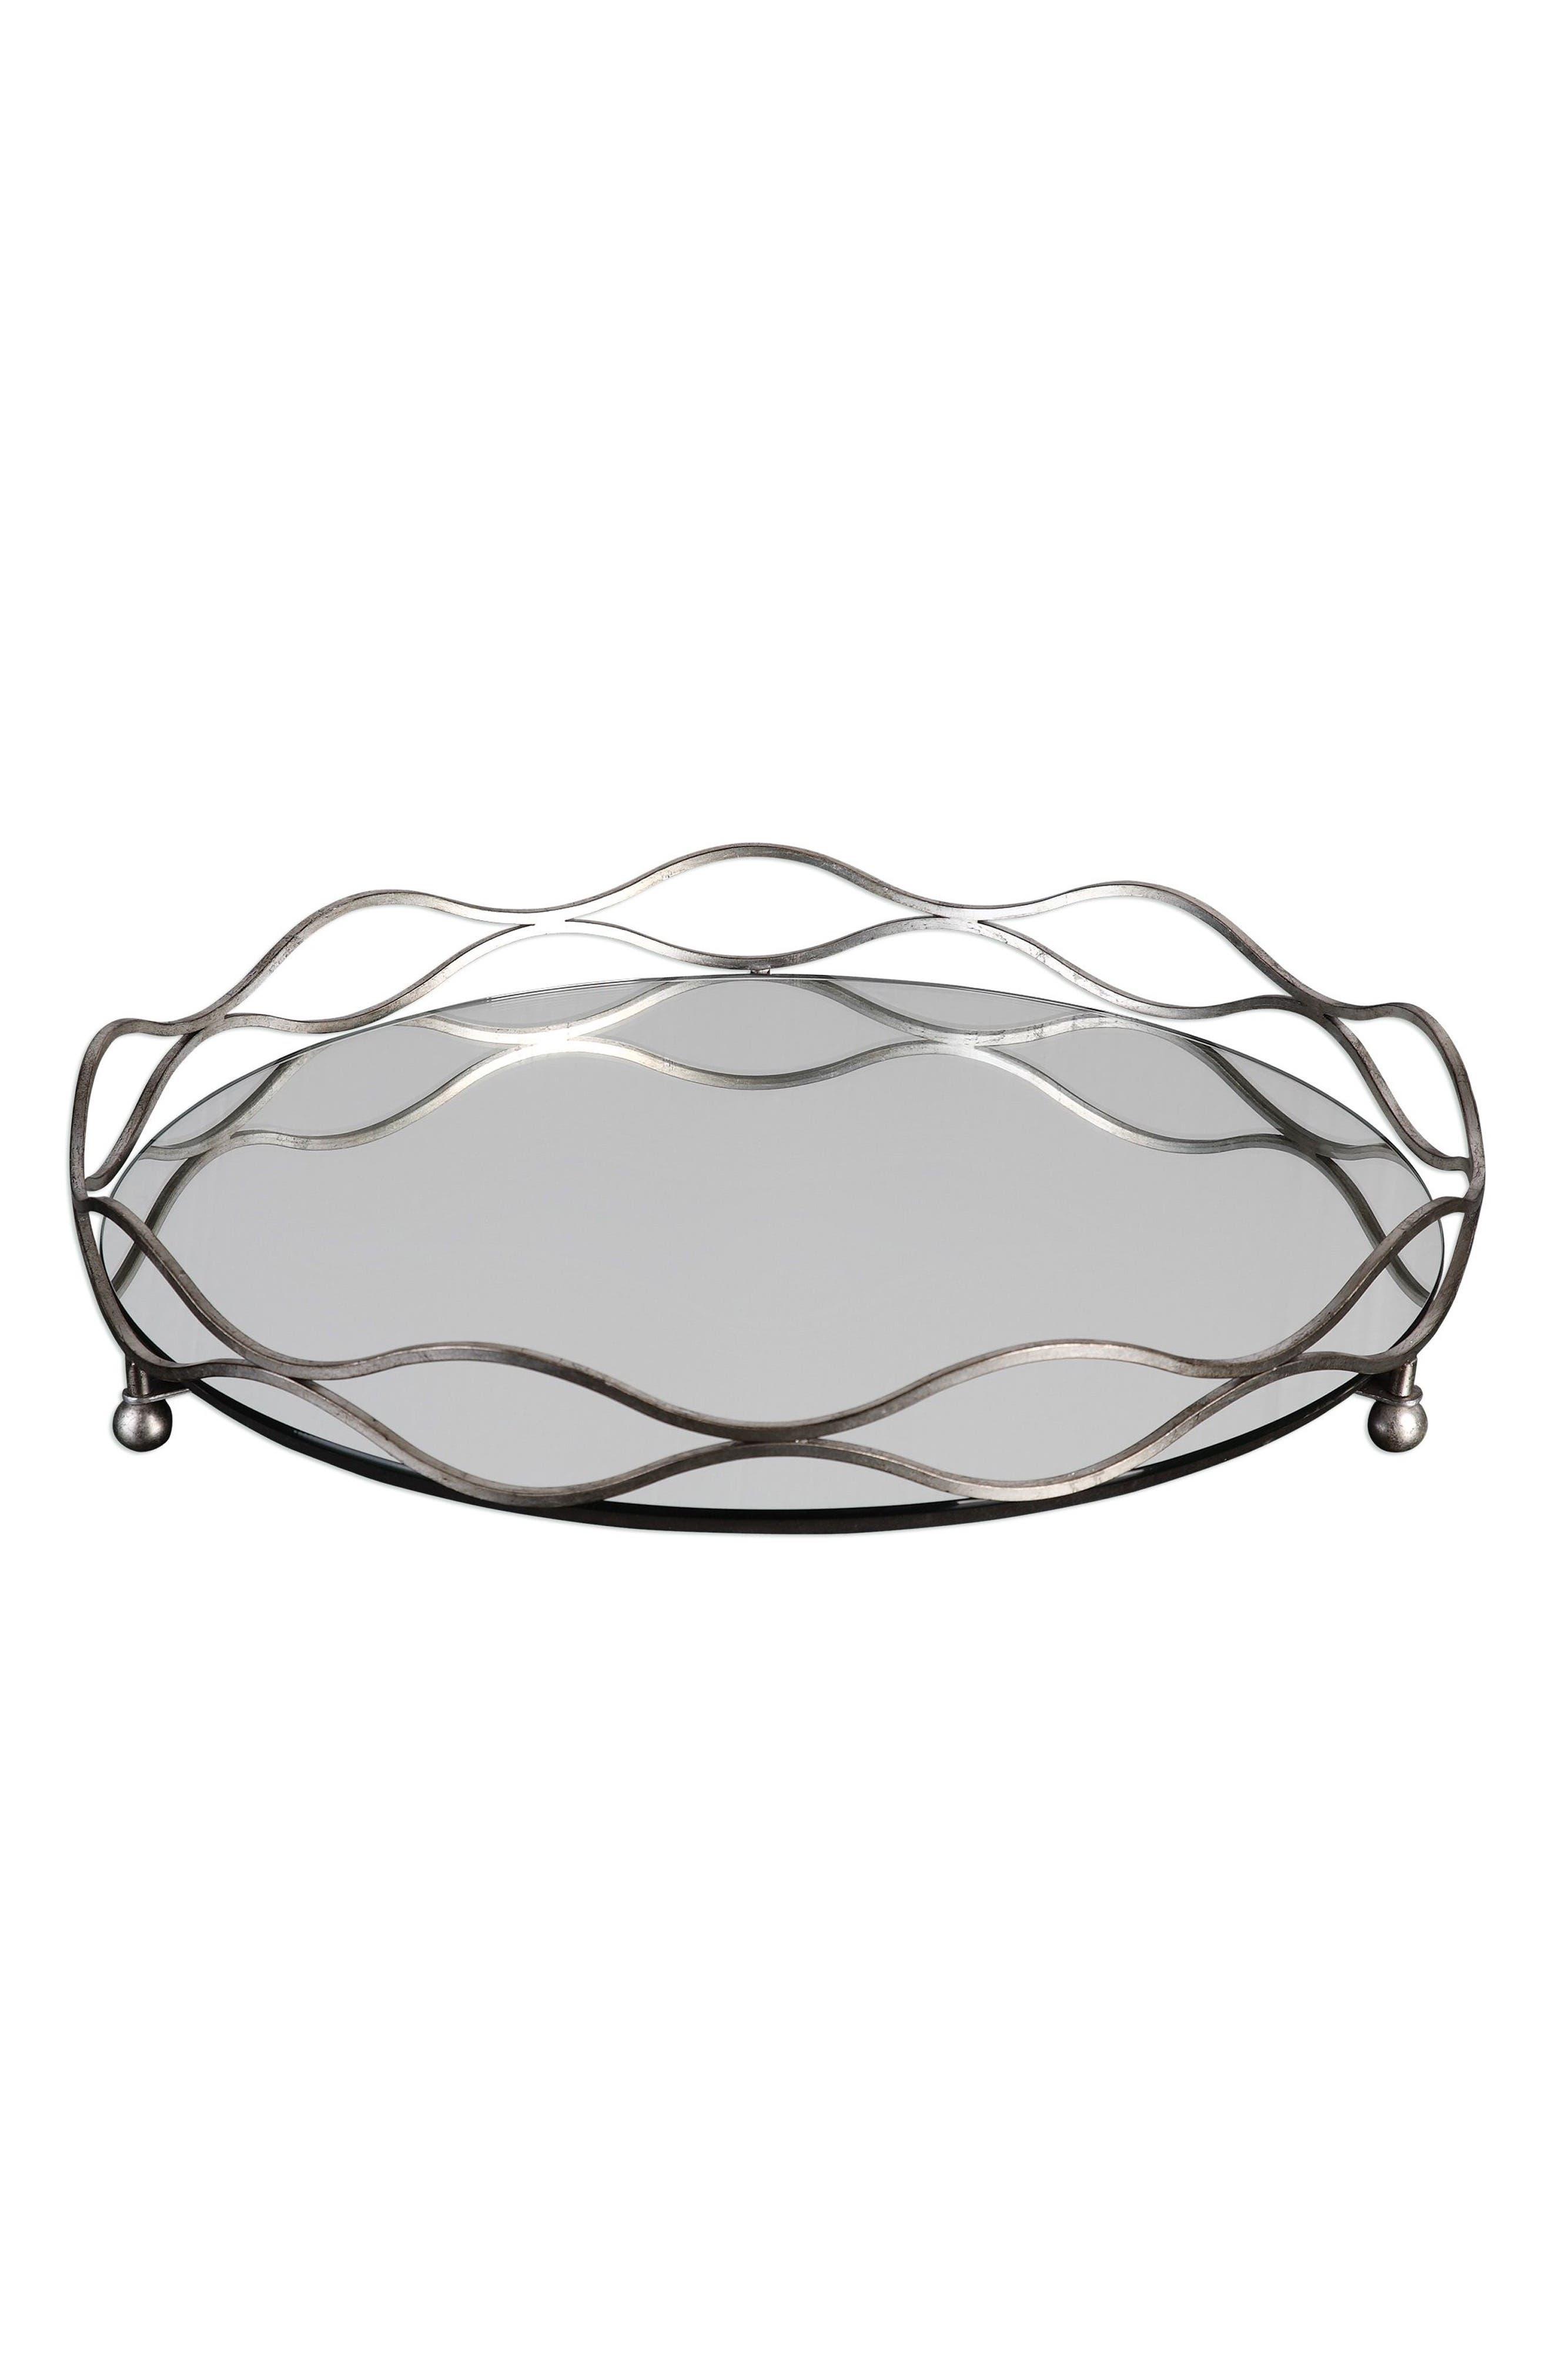 Mirrored Tray,                             Main thumbnail 1, color,                             040